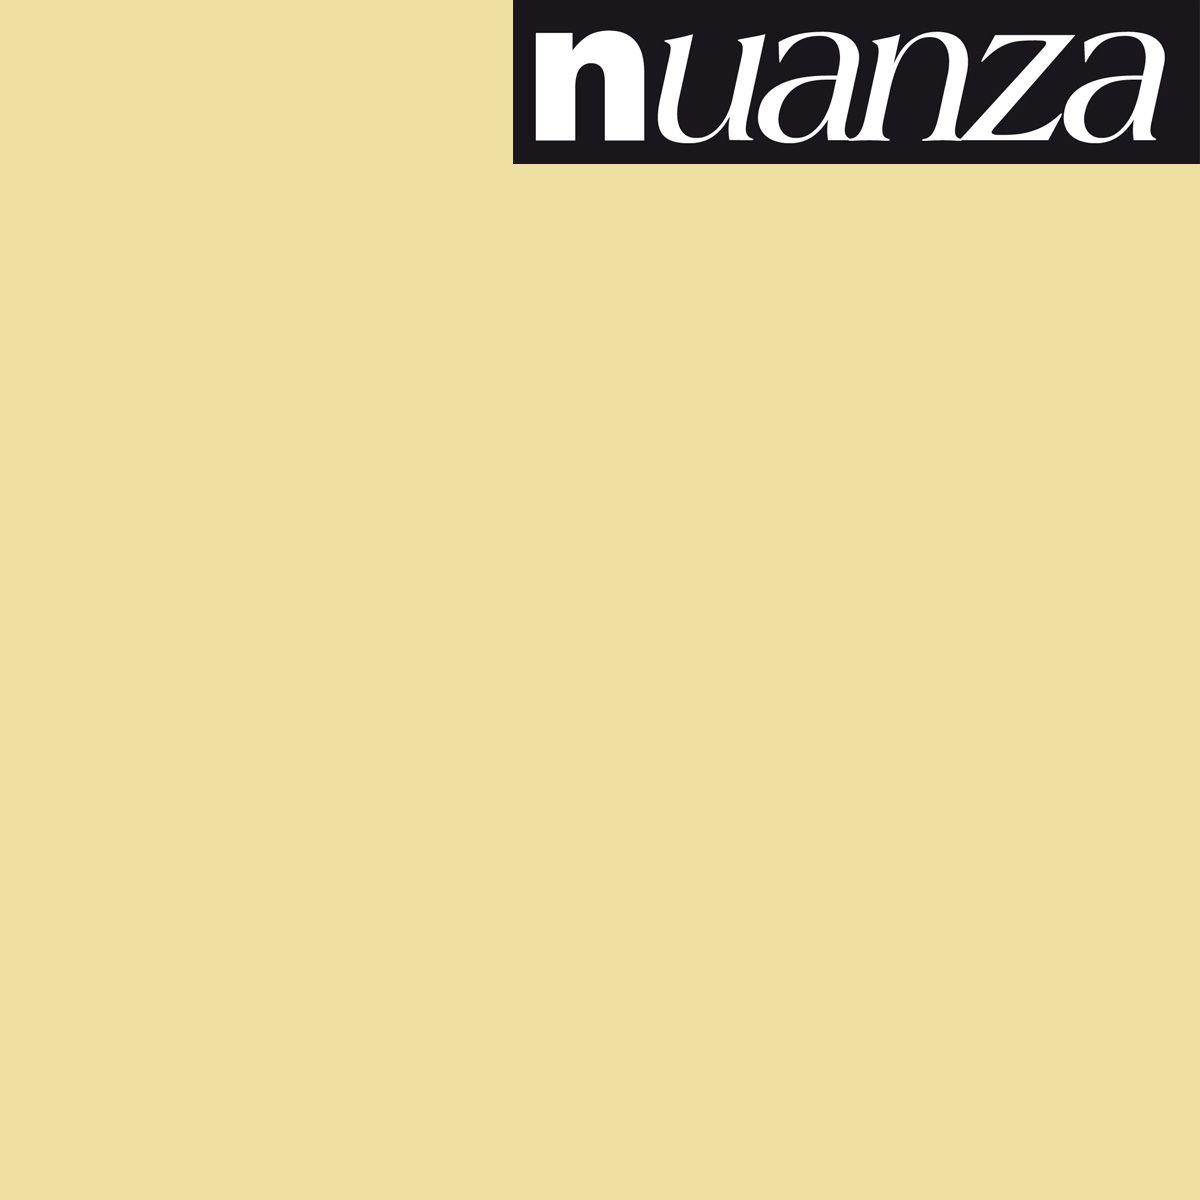 Peinture Nuanza satin jaune vichy 2.5l